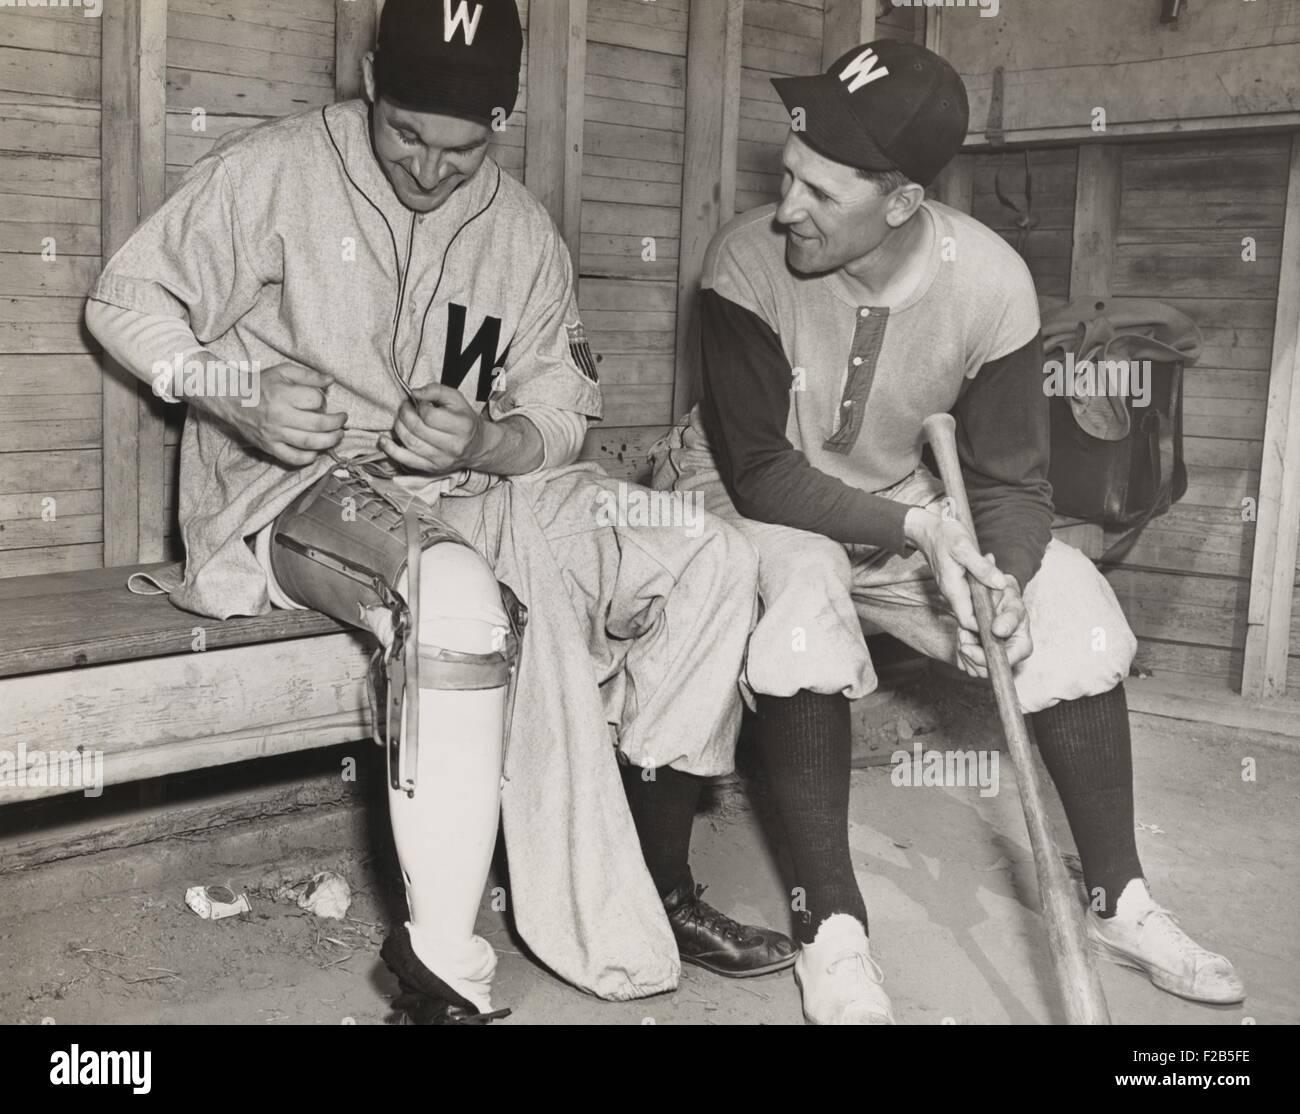 Washington Senators pitcher, Lt. Bert R. Shepard, as Manager Ossie Bluege looks on. March 30, 1945. The veteran - Stock Image